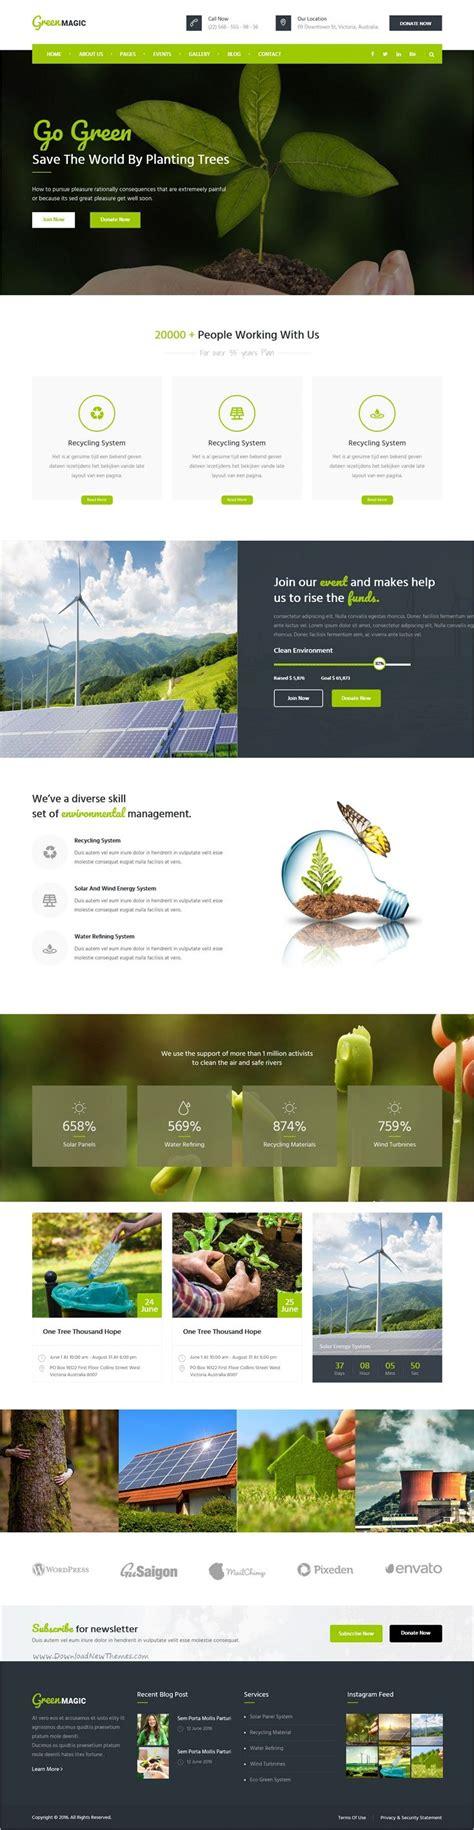 Desarrollo Web Templat by Green Magic Environment Non Profit Html Template